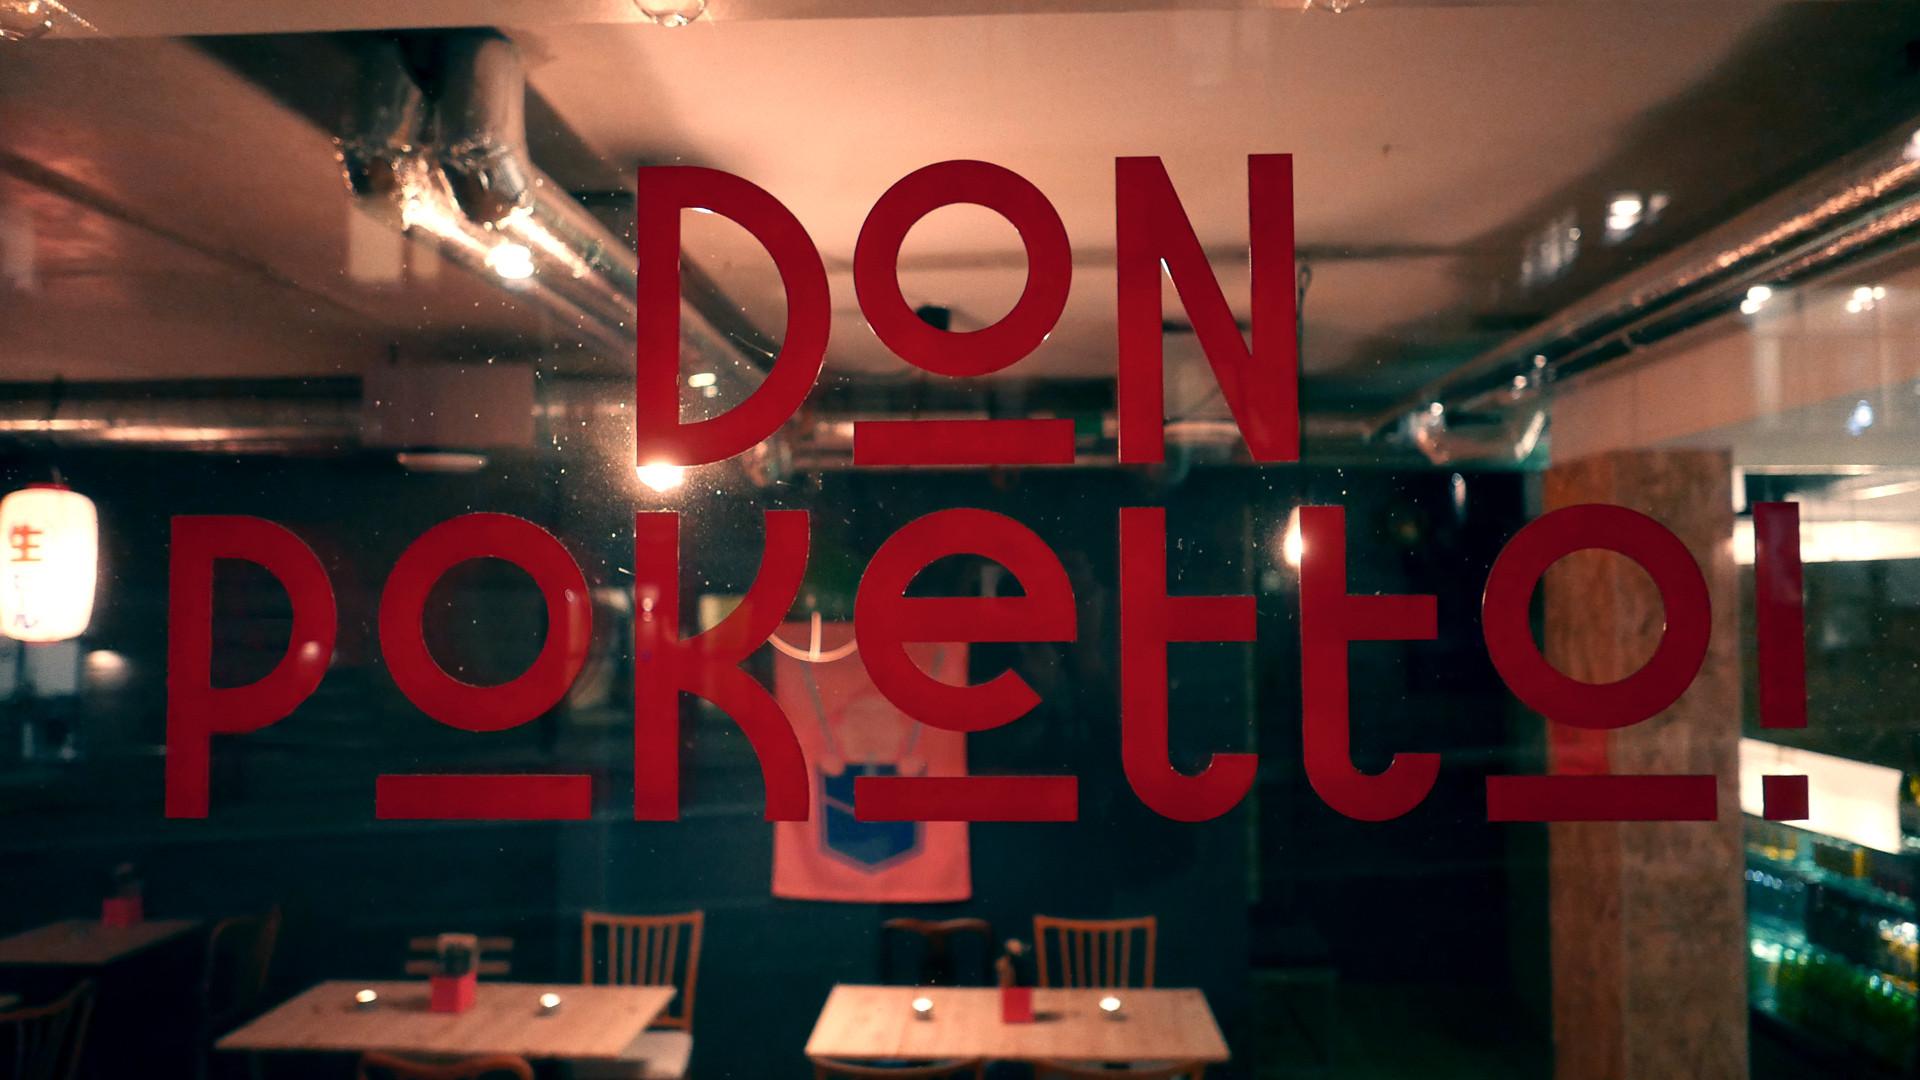 DonPoketto_skylt#2.jpg